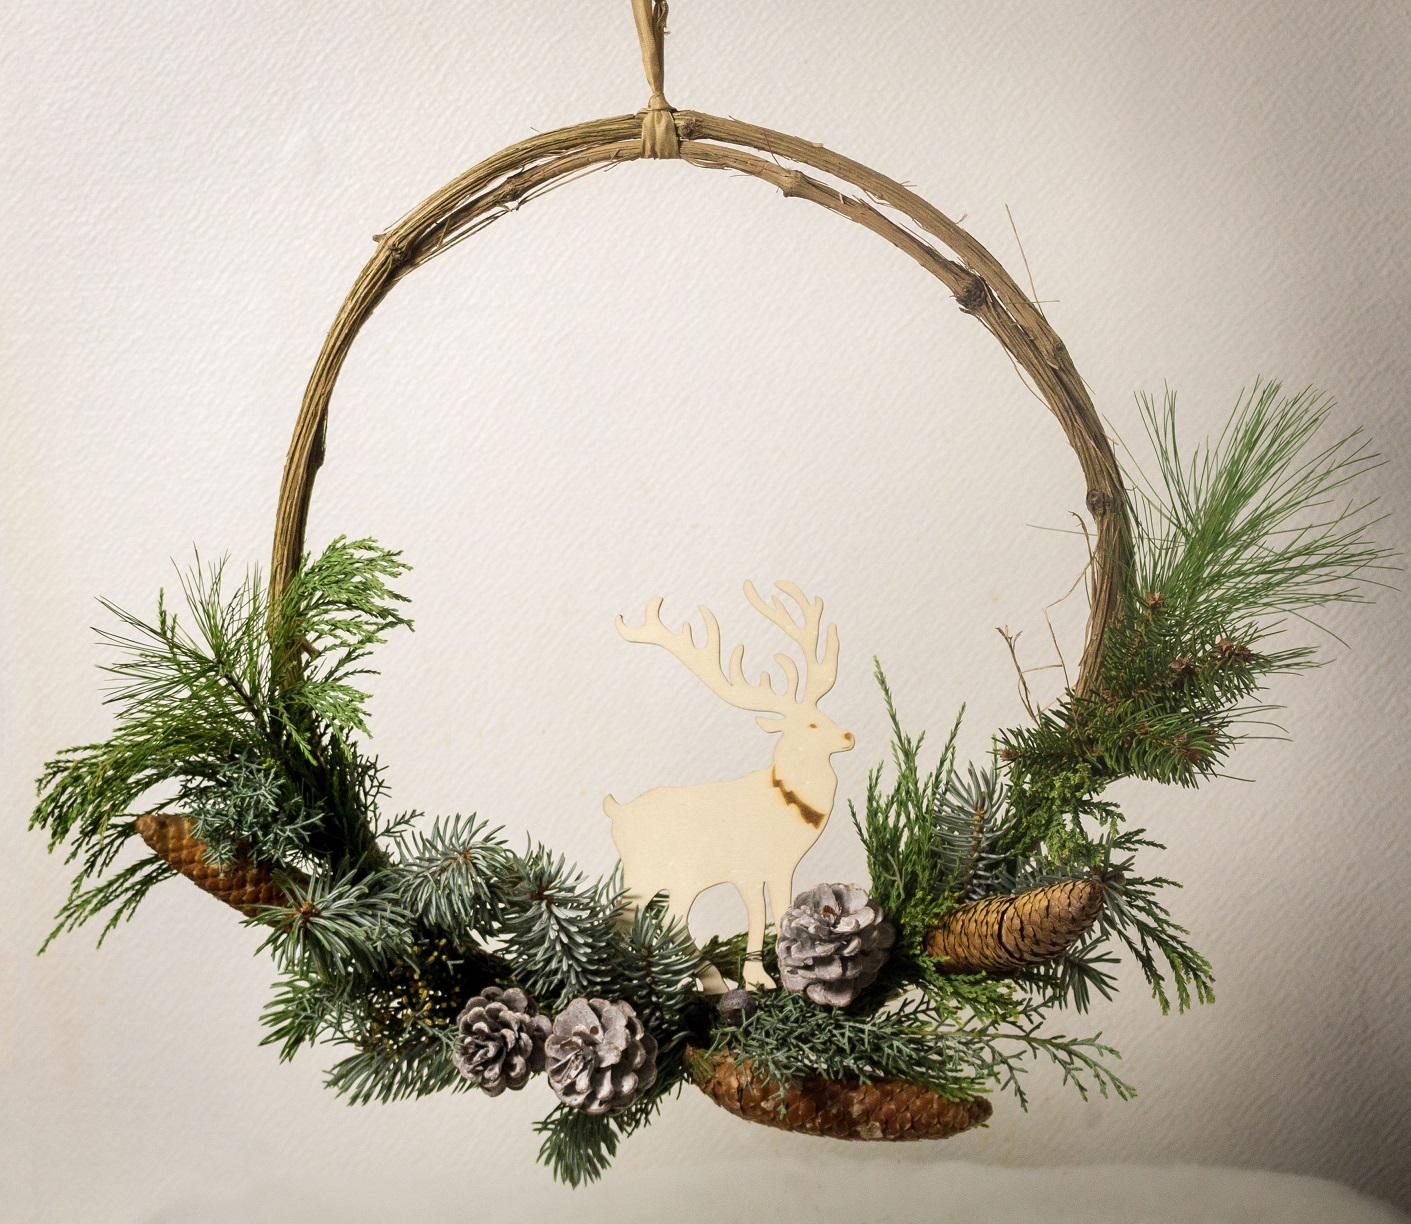 Couronne de porte de Noël